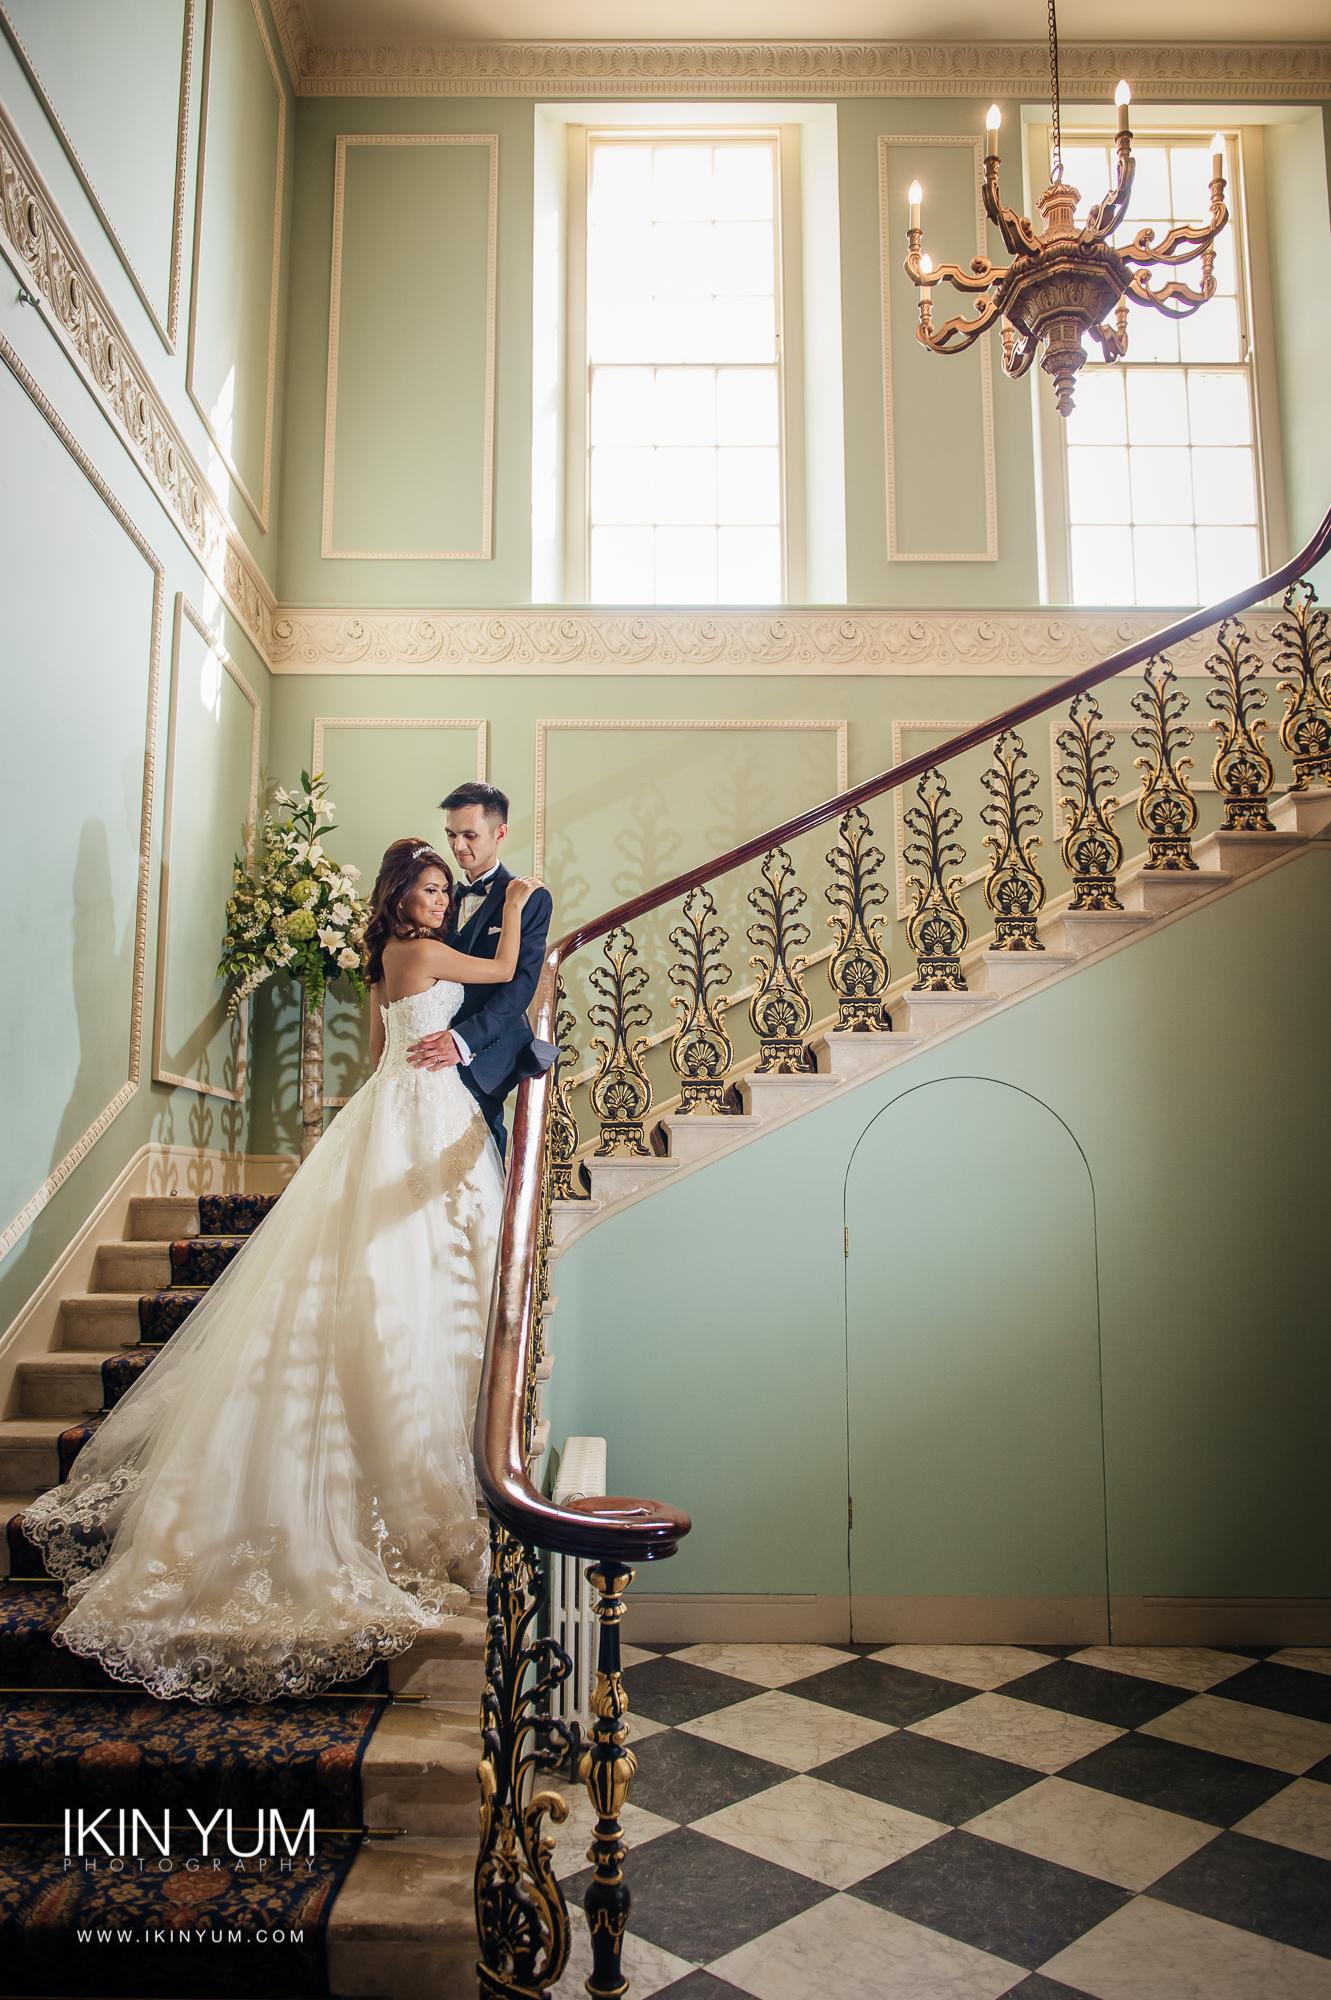 Hylands House Wedding - Ikin Yum Photography-097.jpg